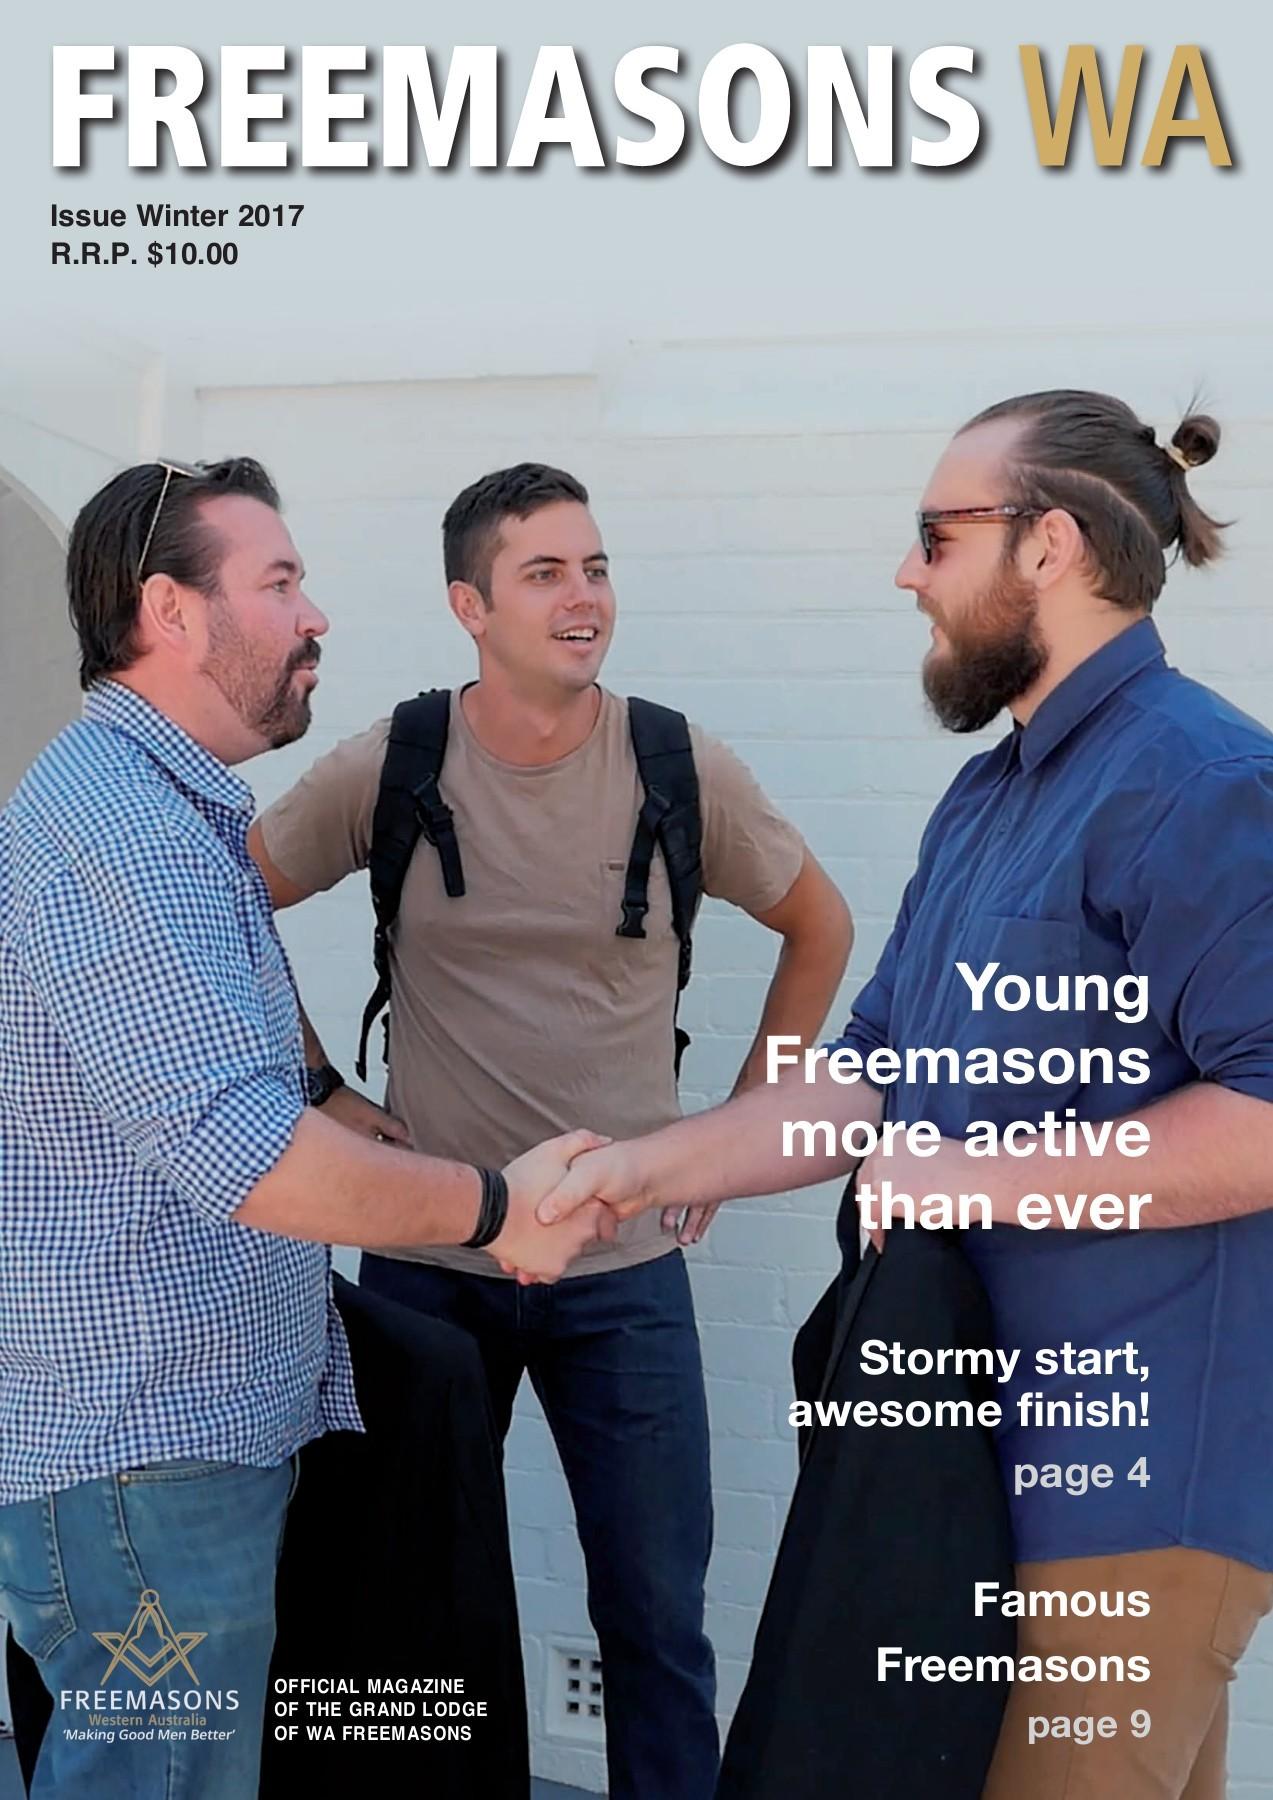 FWA Magazine - Grand Lodge of Western Australia